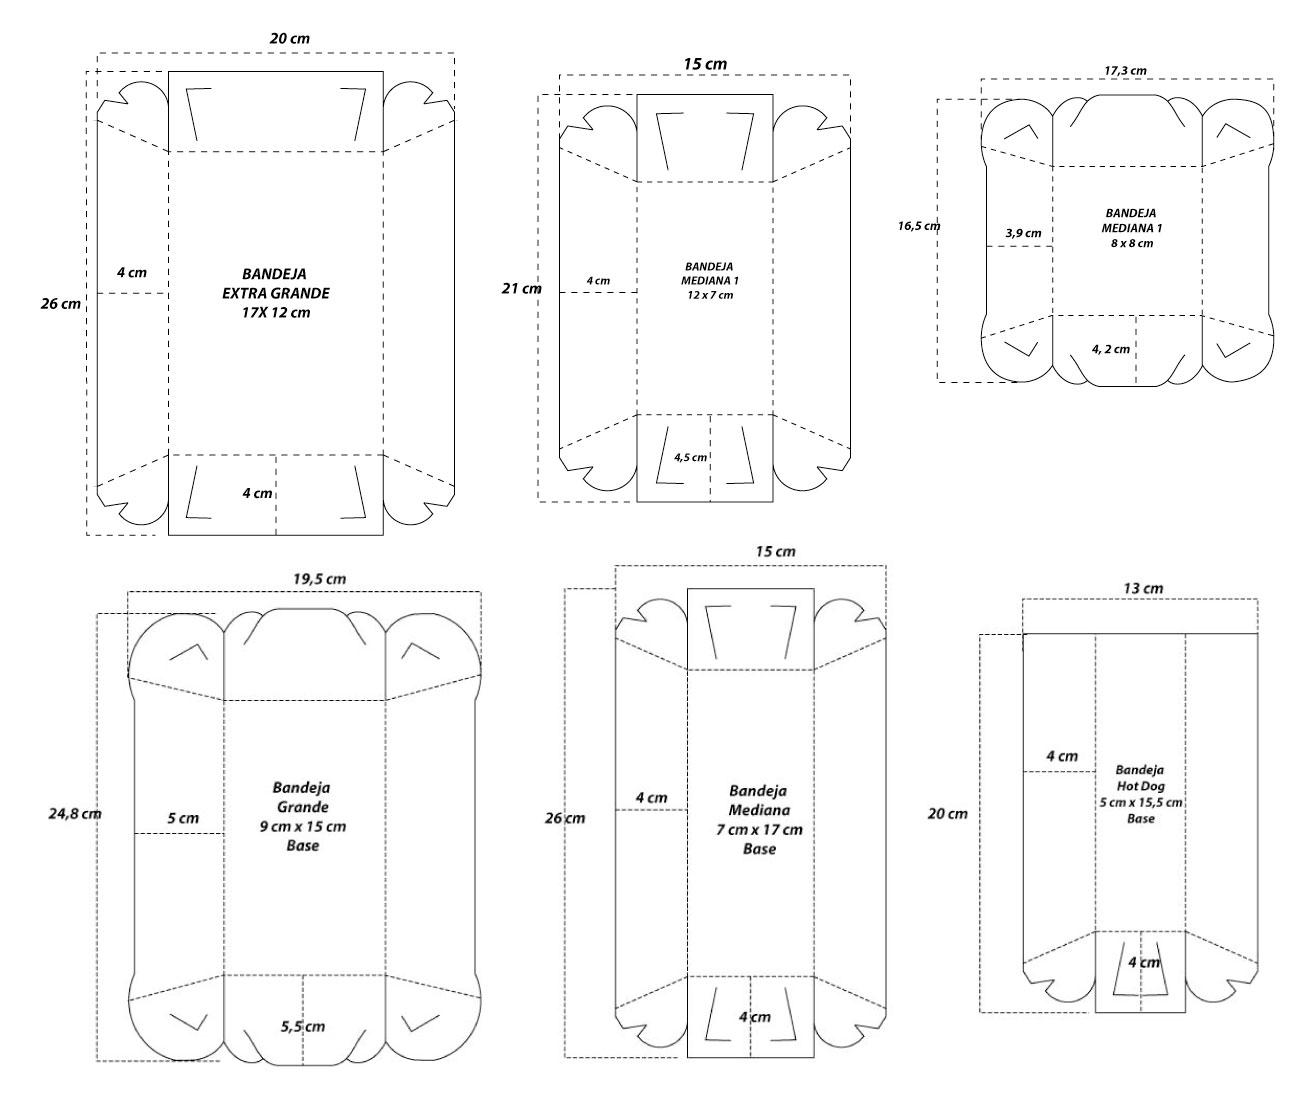 bandejas-de-papel-y-cartulina-fundas-de-papel-100-ecologico-biodegradable-ecologico-boga-fundas-de-papel